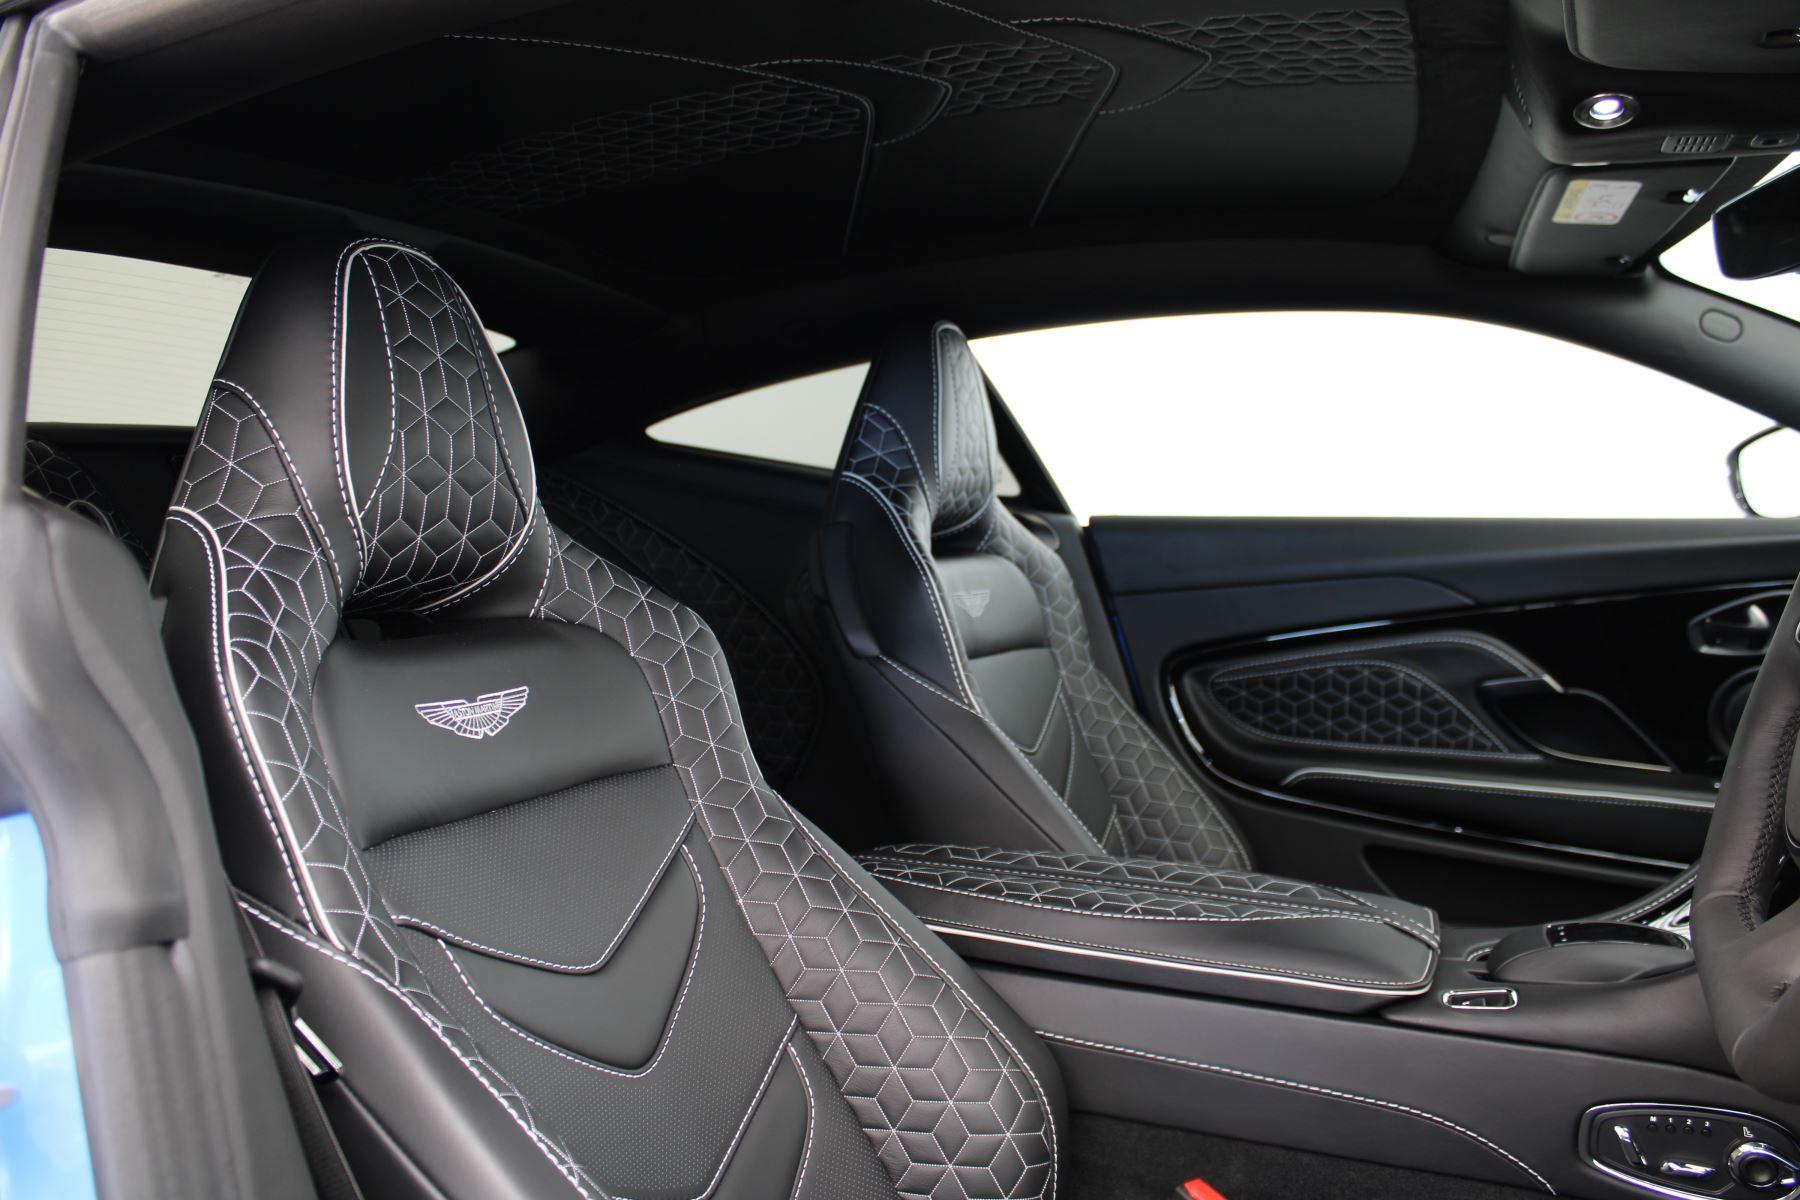 Aston Martin DBS V12 Superleggera Touchtronic Special Ceramic Blue - B&O image 25